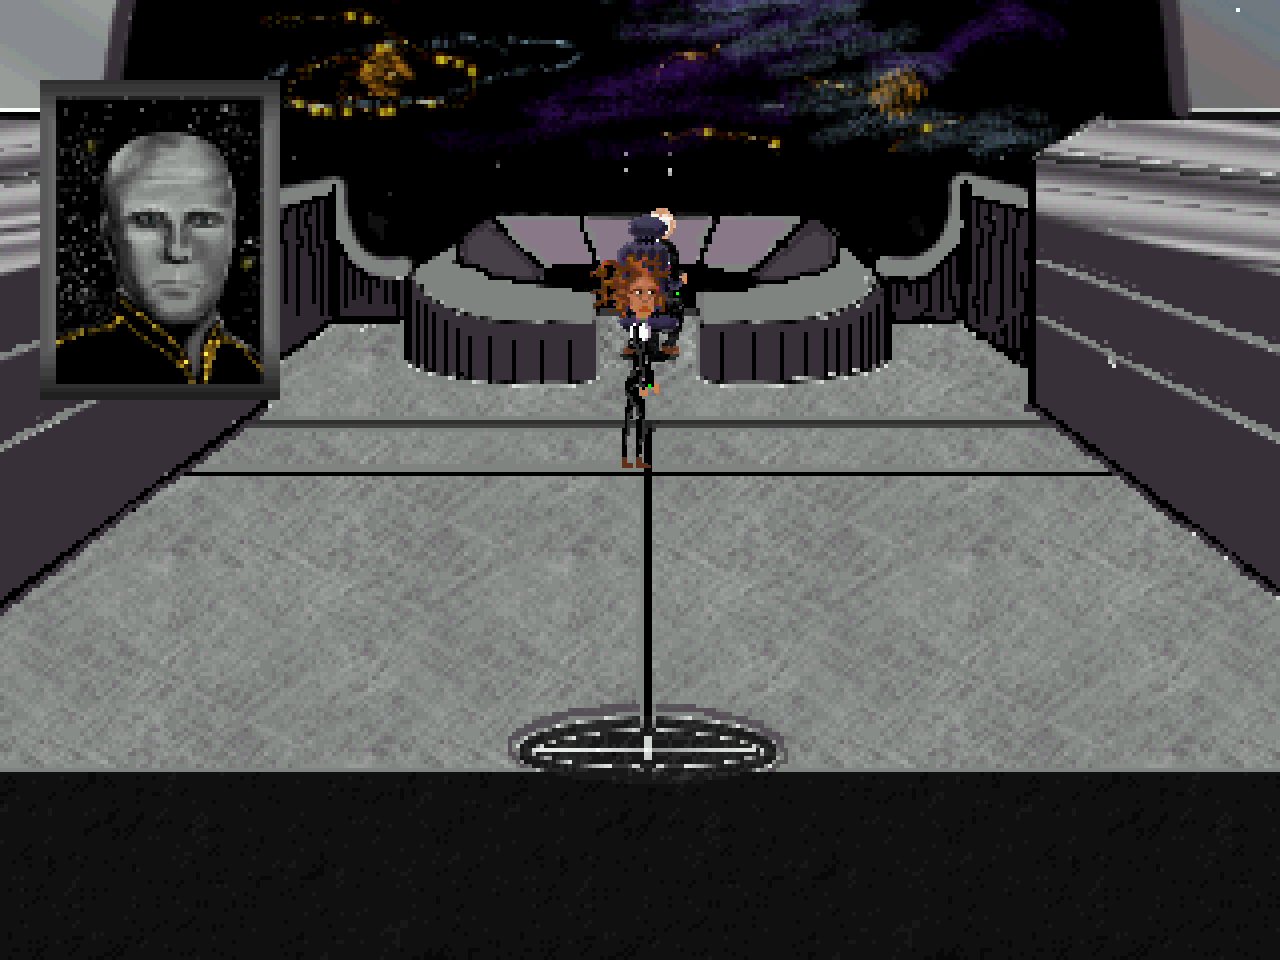 Screenshot 2 of Interstellar Borders width=